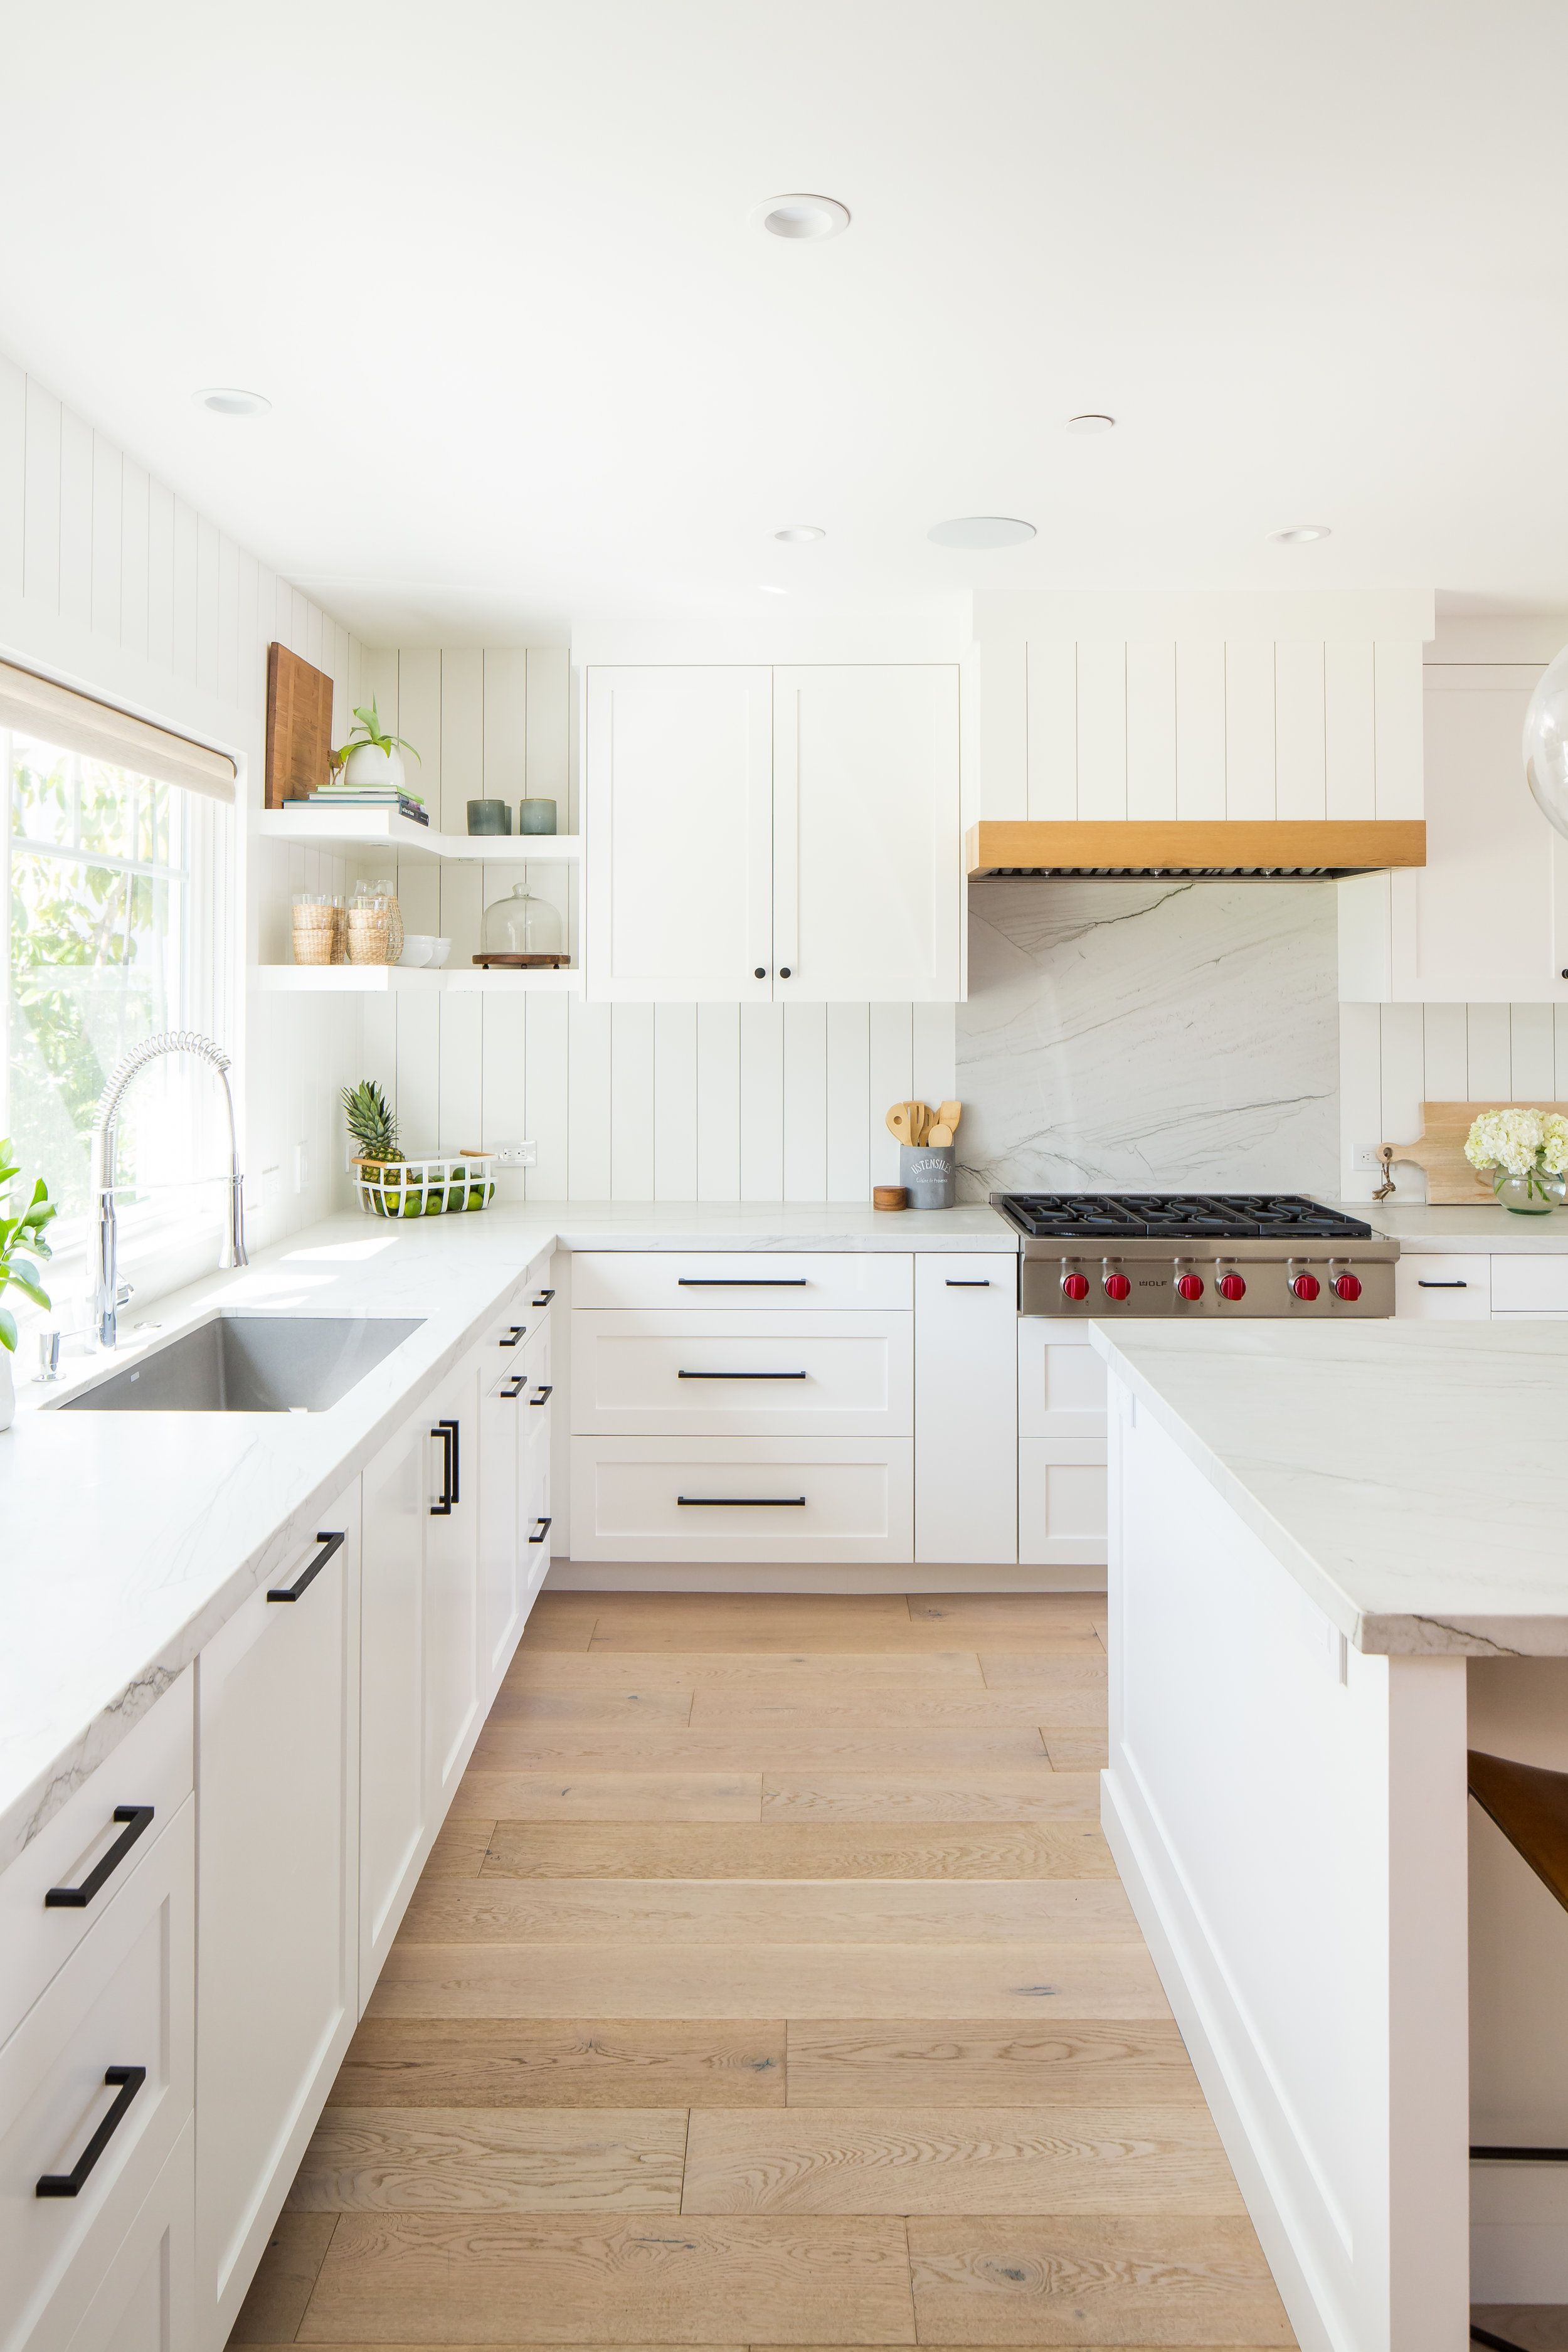 New Kitchen Design Tiles In Kitchen Design Modern Kitchen Design Ideas Kitchen Design Galley In 2020 White Cottage Kitchens Cottage Style Kitchen Shiplap Kitchen